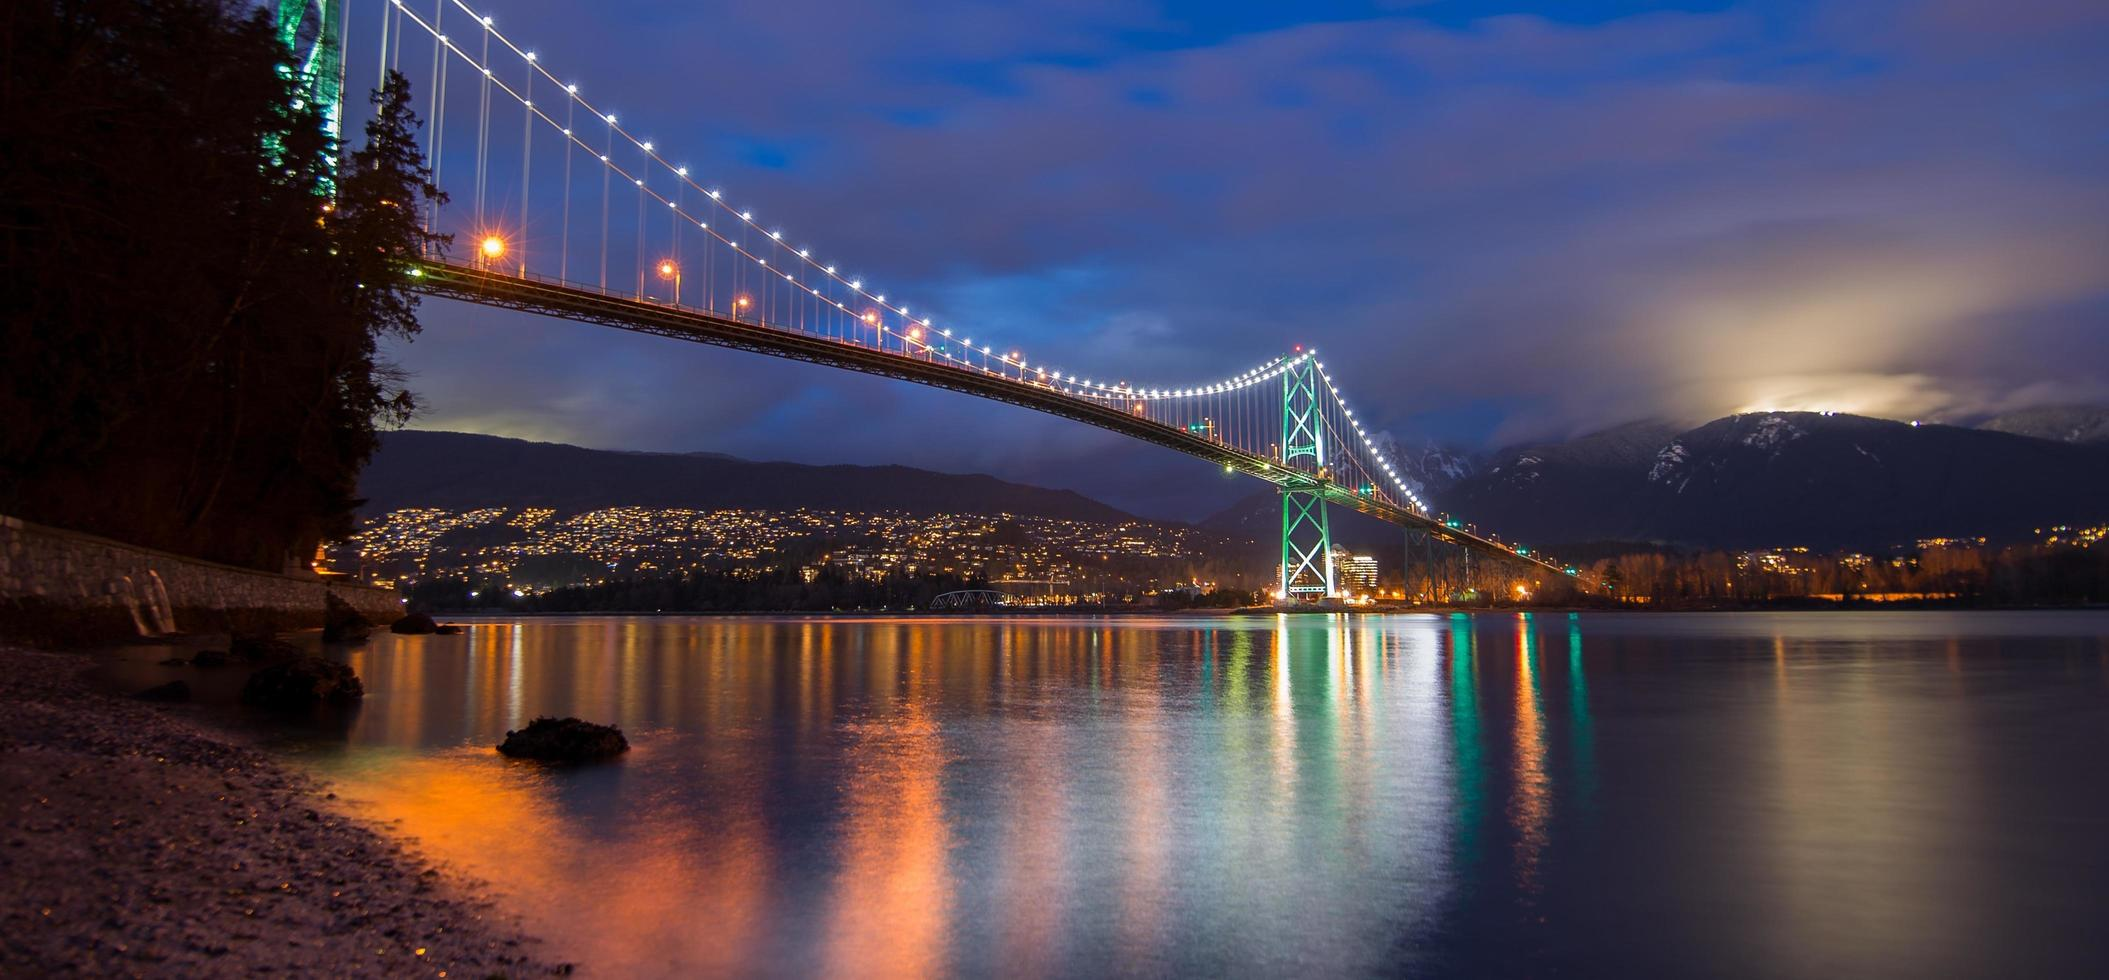 puente Golden Gate en la noche foto